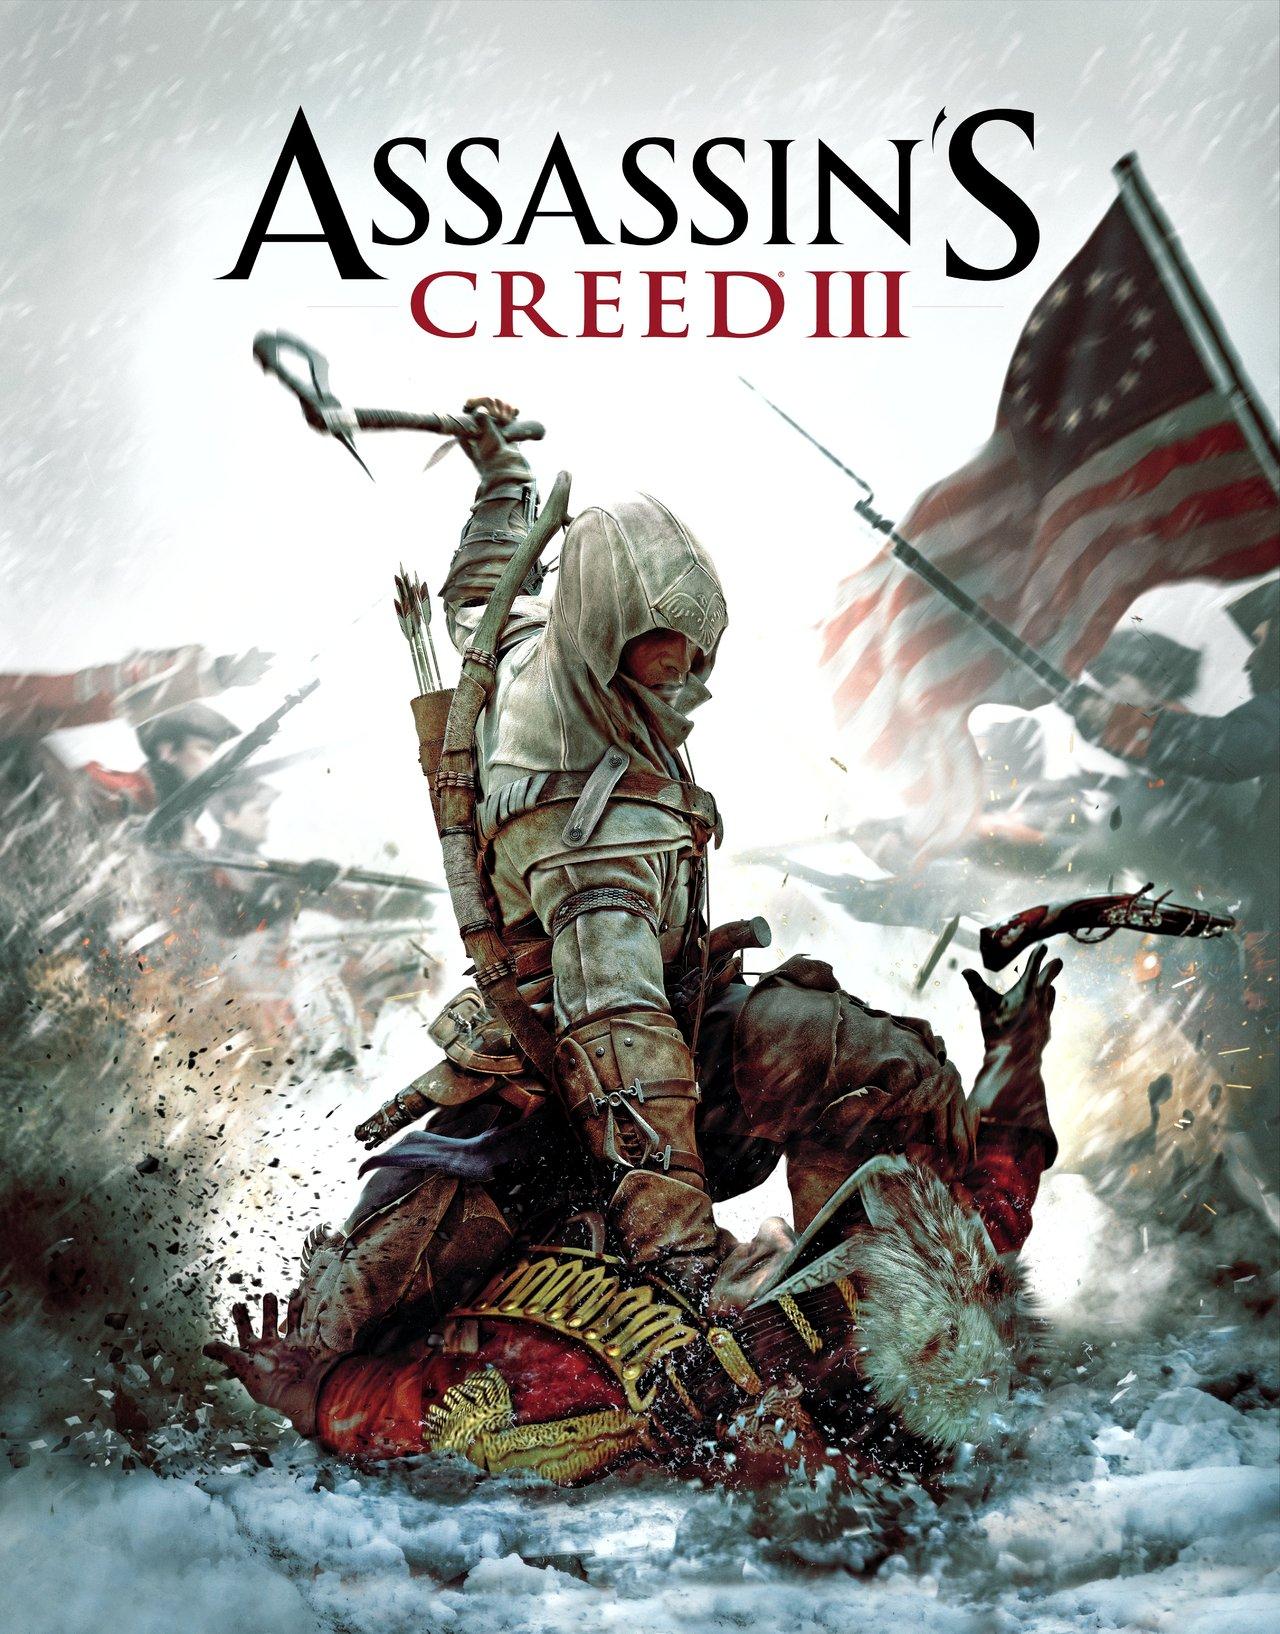 دانلود زیرنویس فارسی فیلم Assassin's Creed III